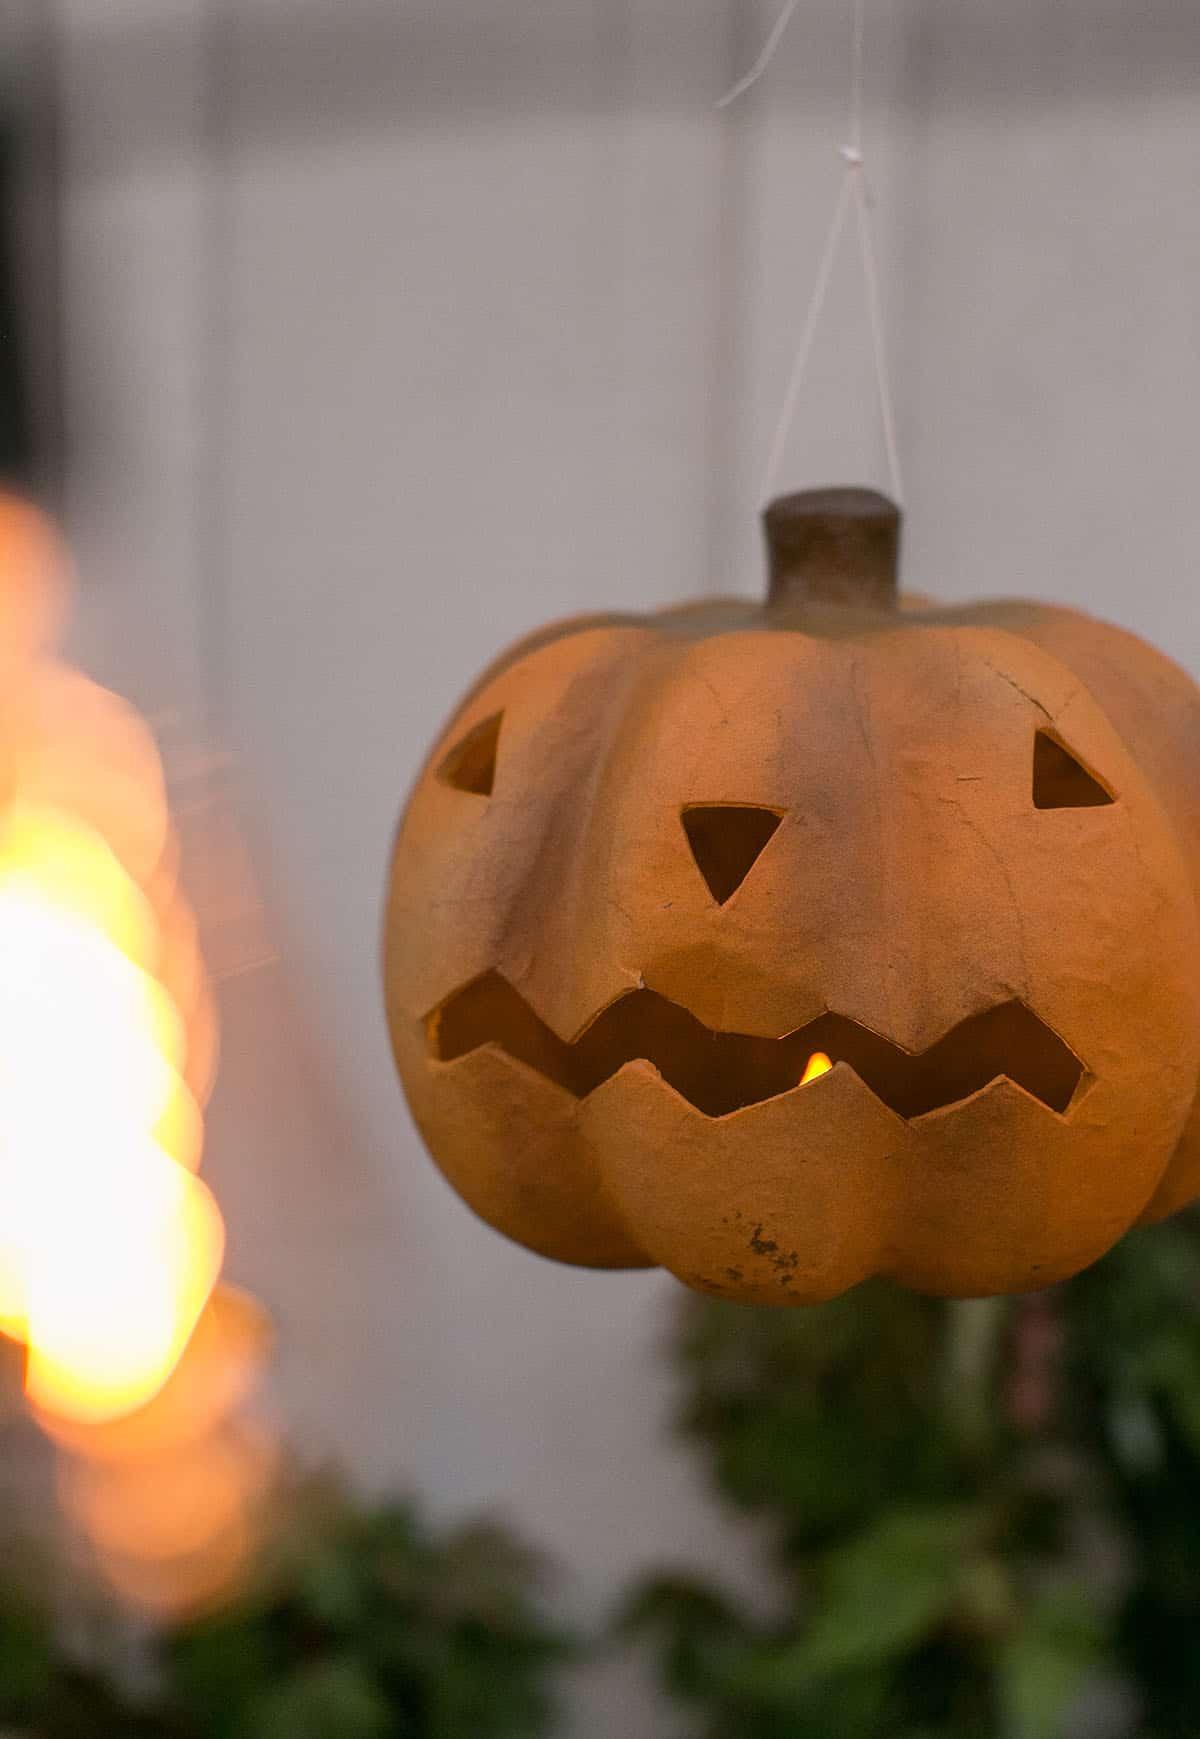 lit up hanging pumpkin